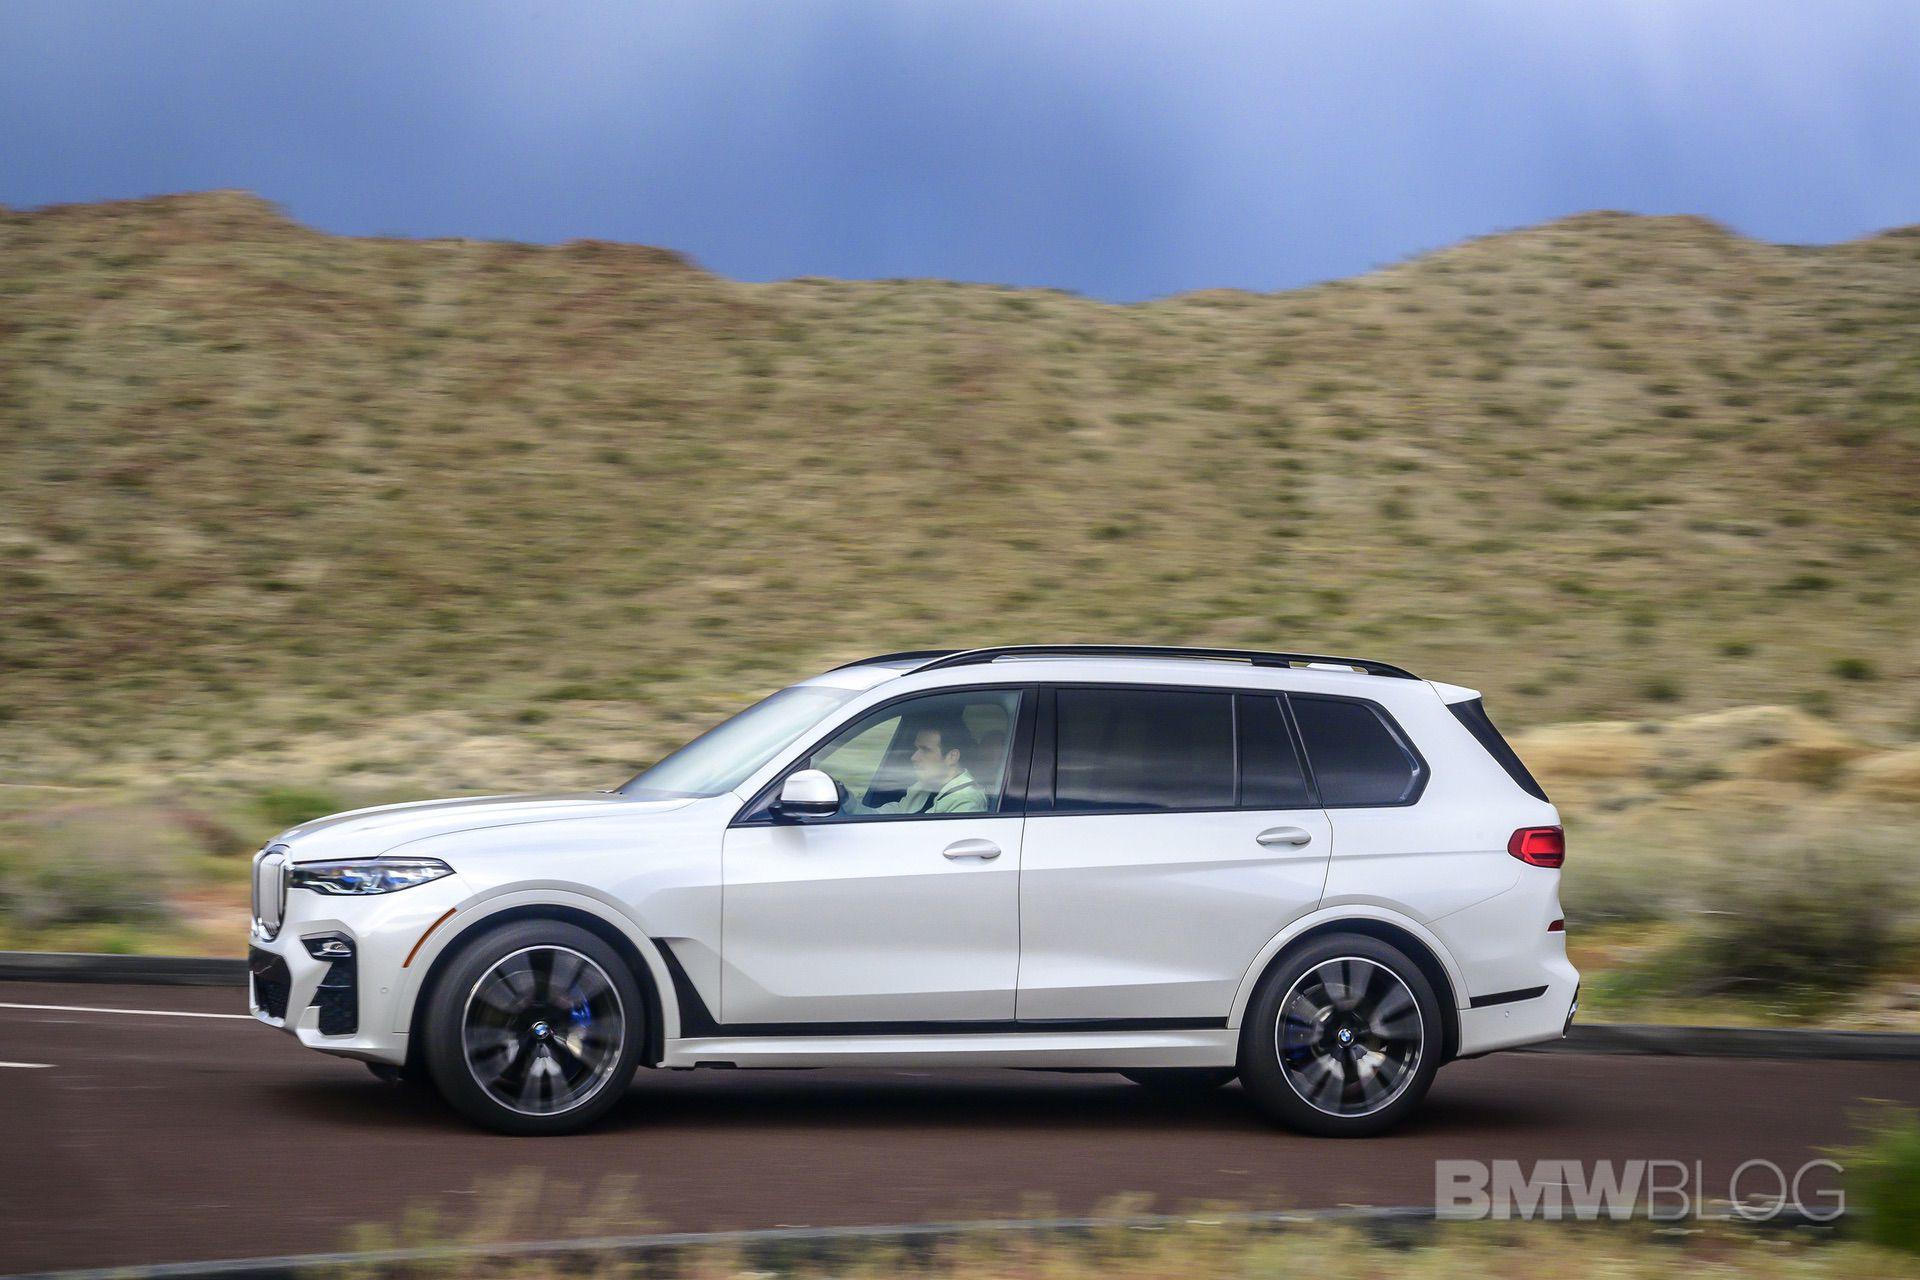 Bmw X6 0 60 >> Motor Trend: BMW X7 40i 0-60 mph in 5.4 seconds